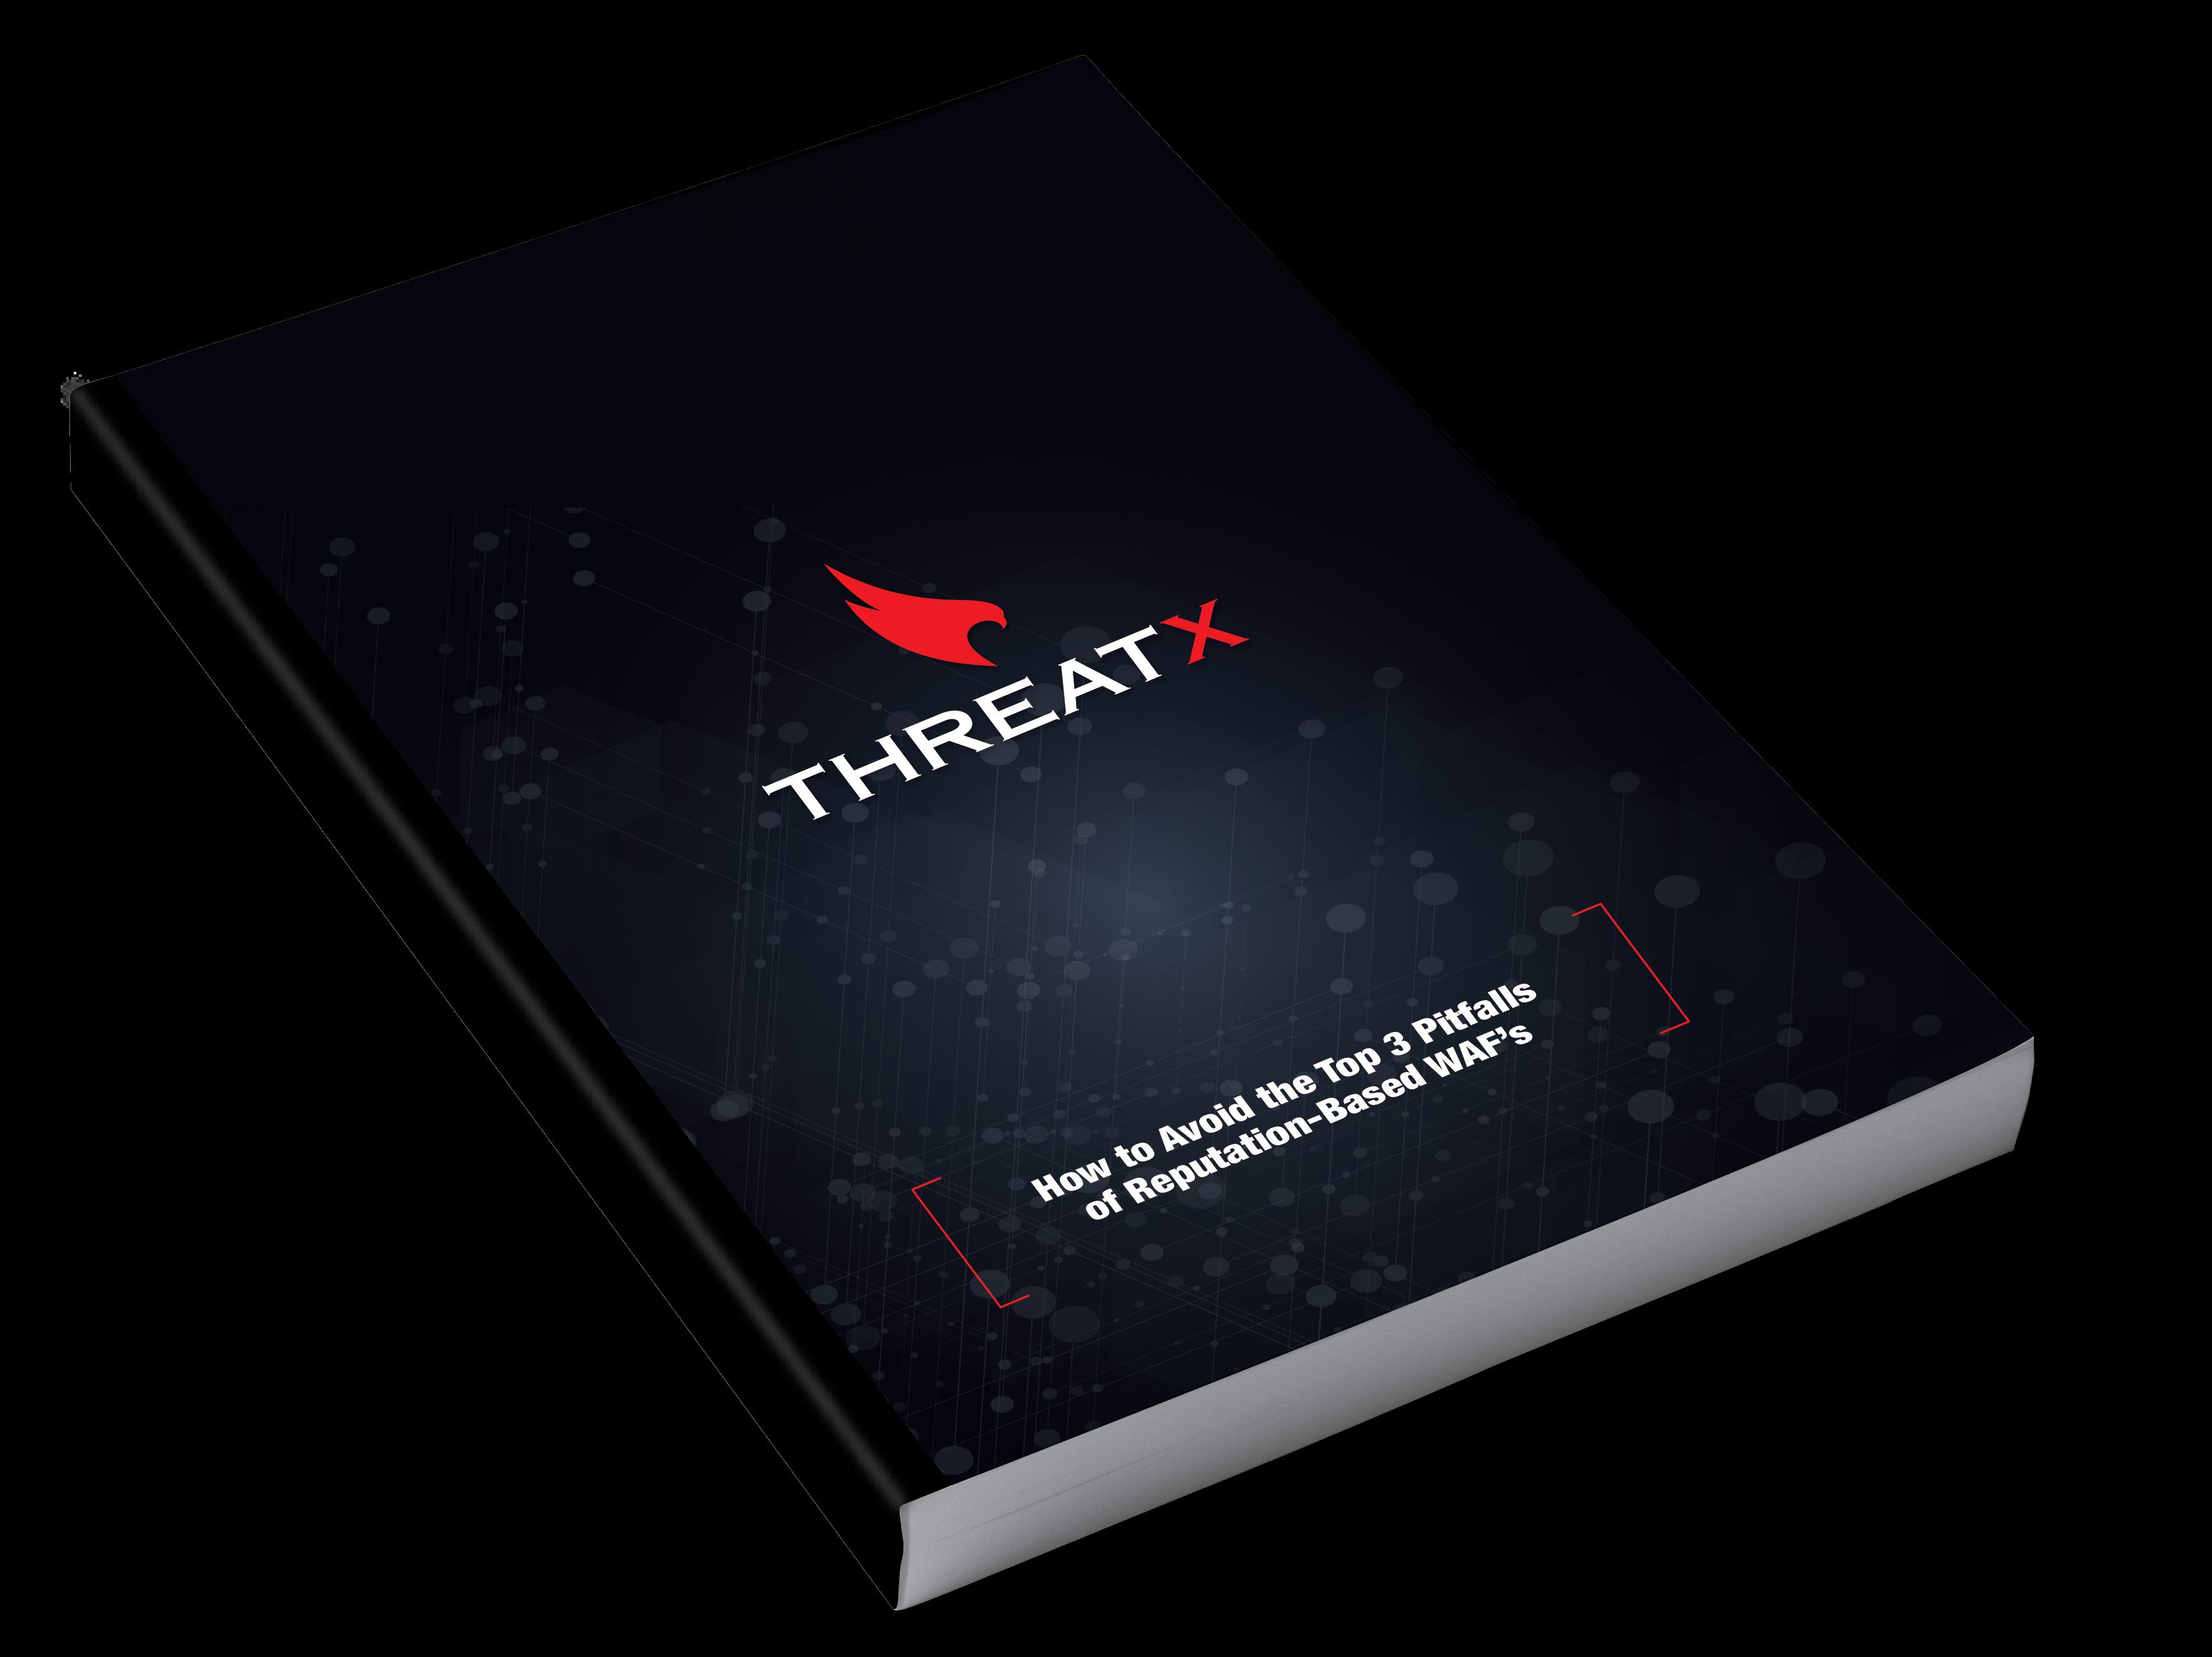 ThreatX_book cover_v2_transparent background cropped